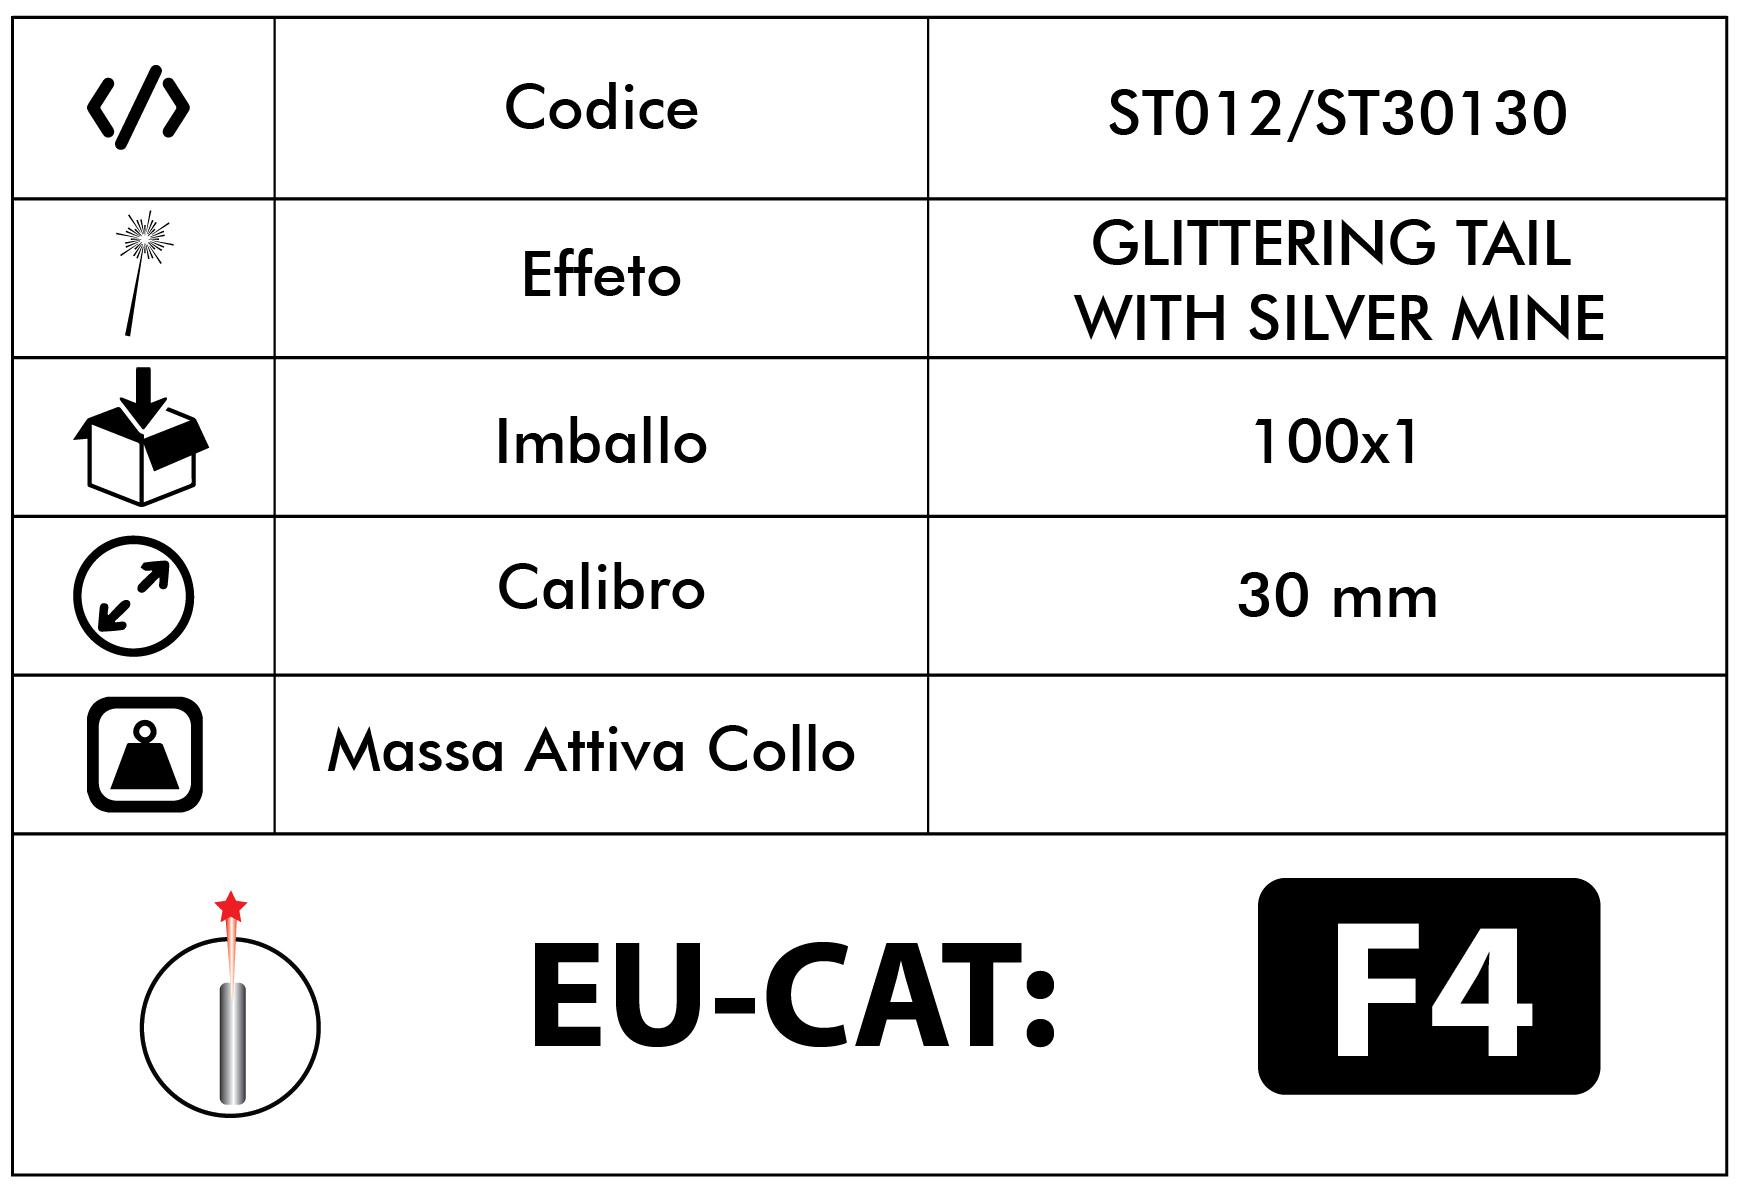 TECNICA_ST012-ST30130.jpg